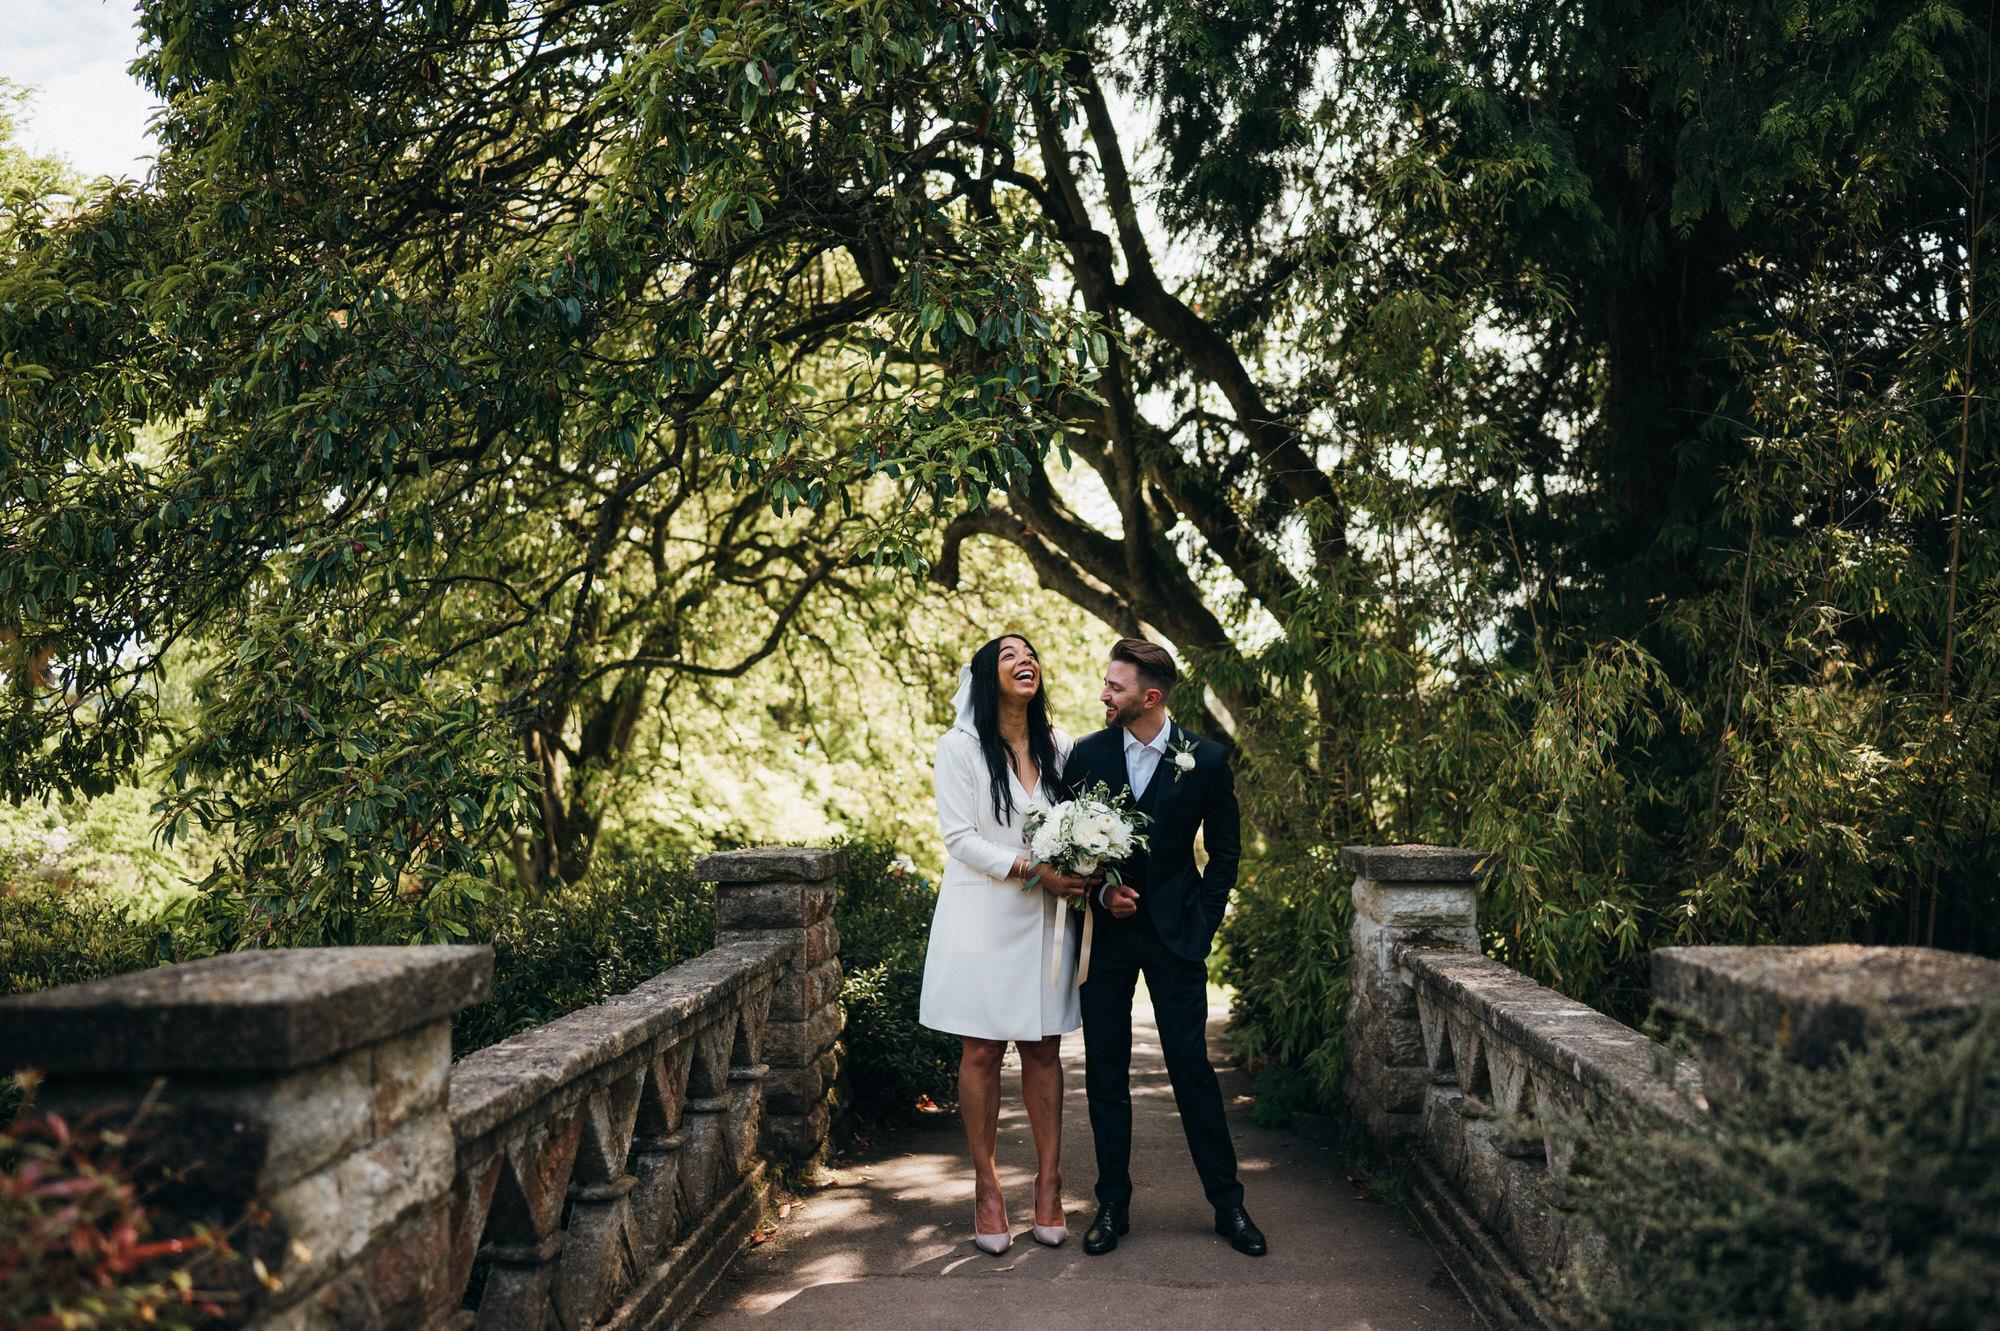 Intimate wedding botanical gardens bath 37